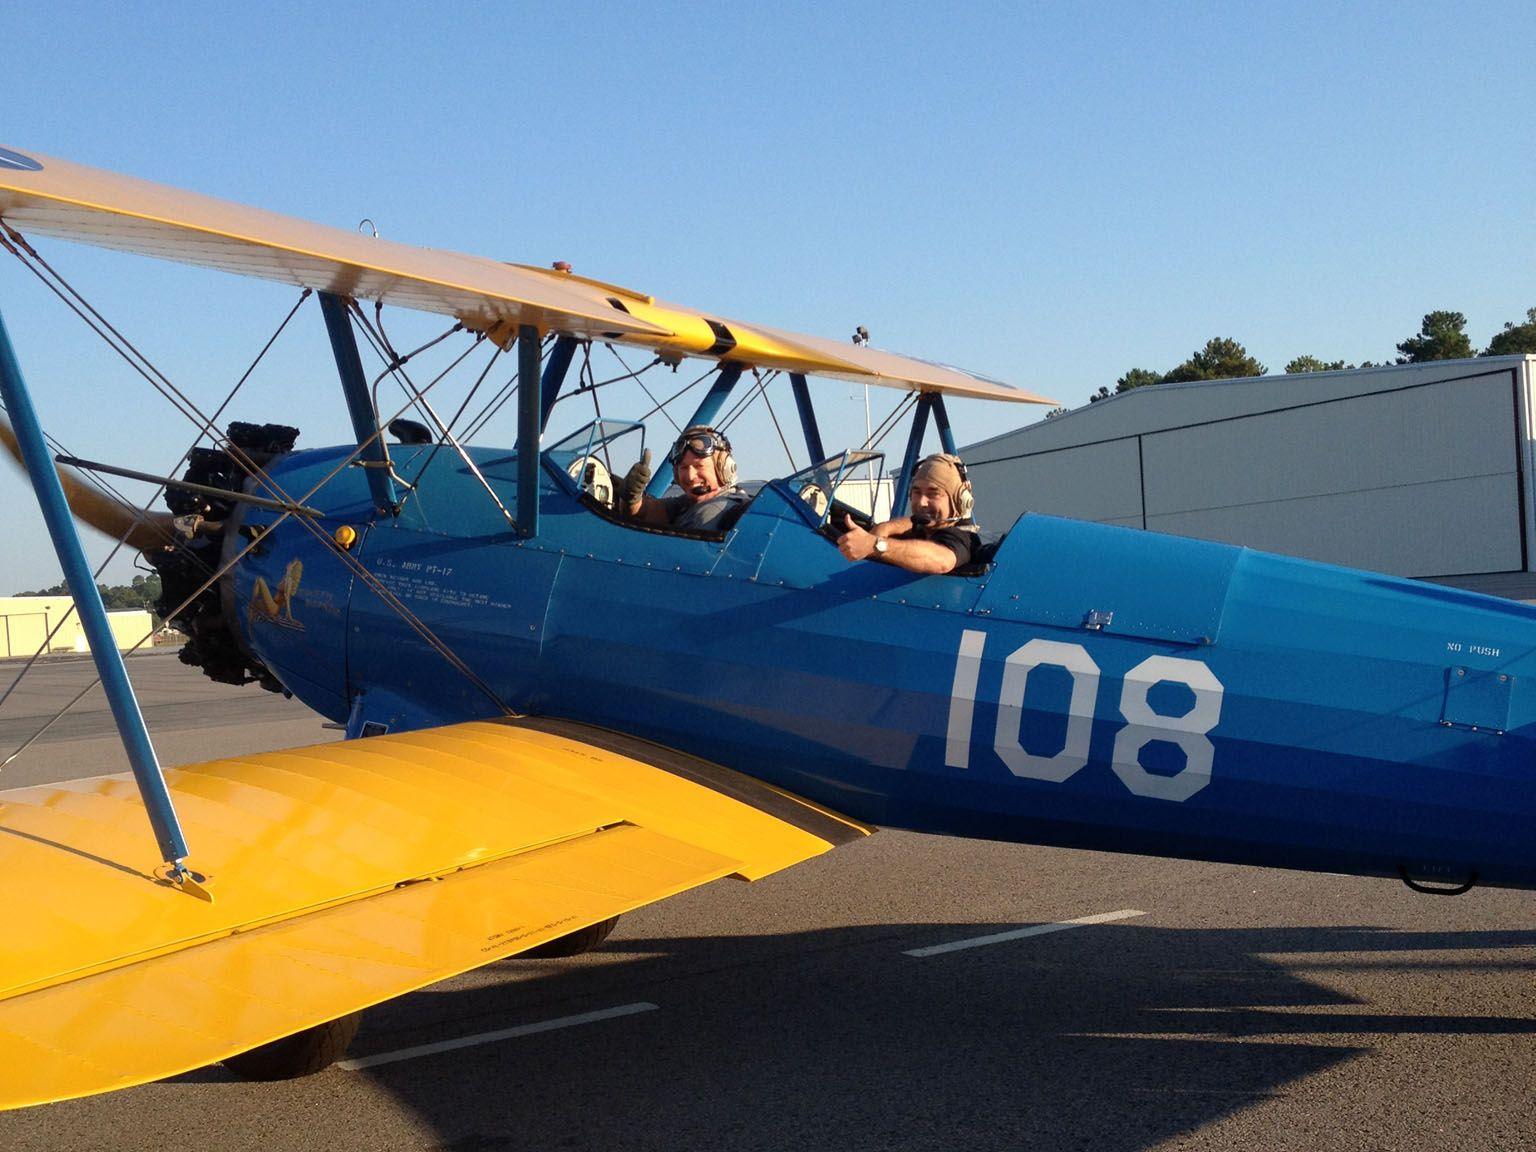 My ride in Stearman biplane at Columbia Owens Field